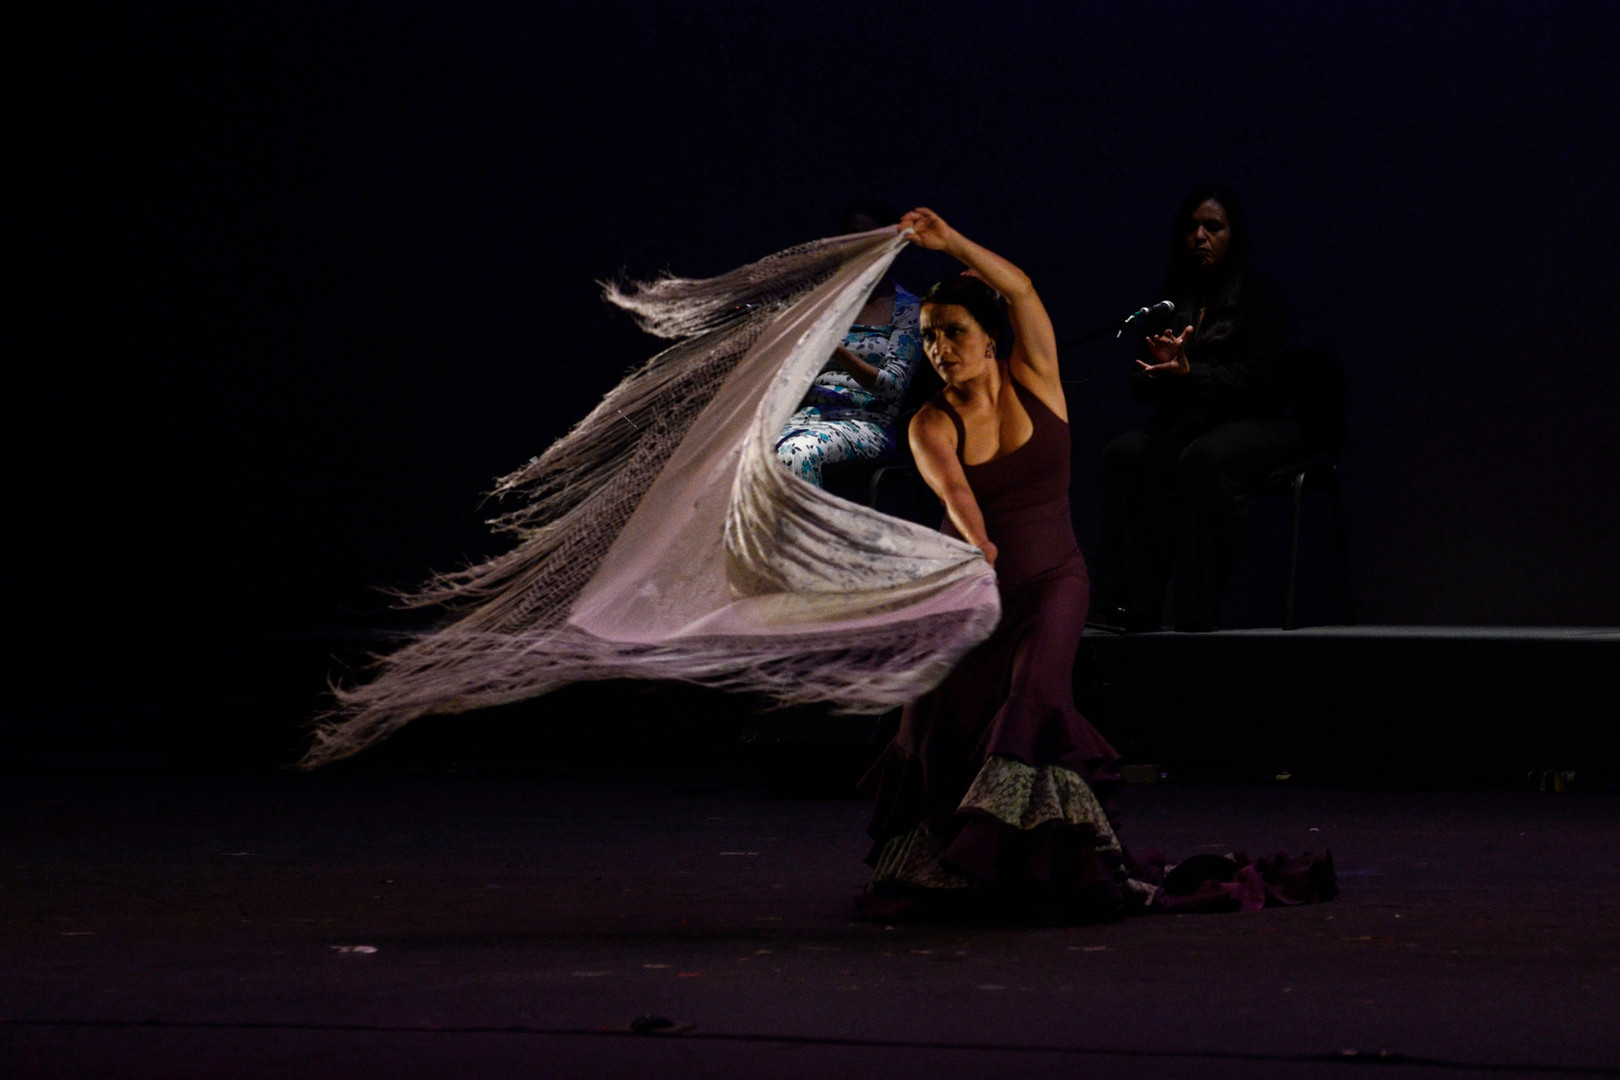 Lina_Ravines Clases de baile flamenco.JP